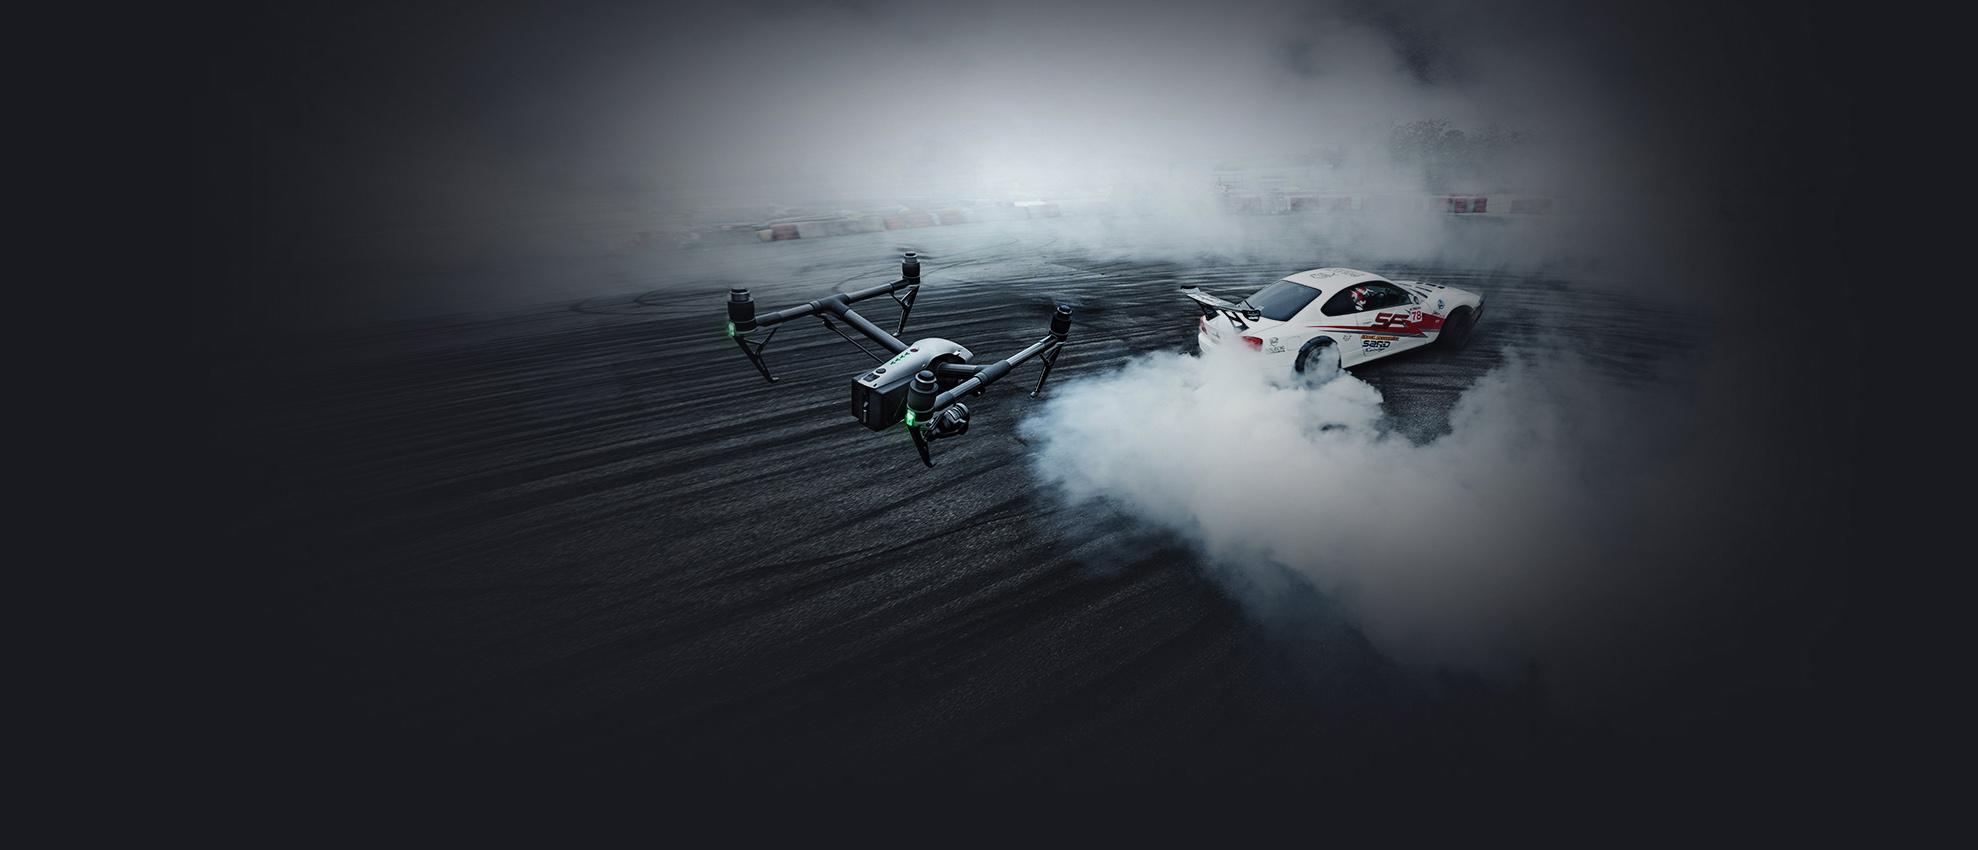 dji-inspire-2-droon-photopoint-kaupokalda